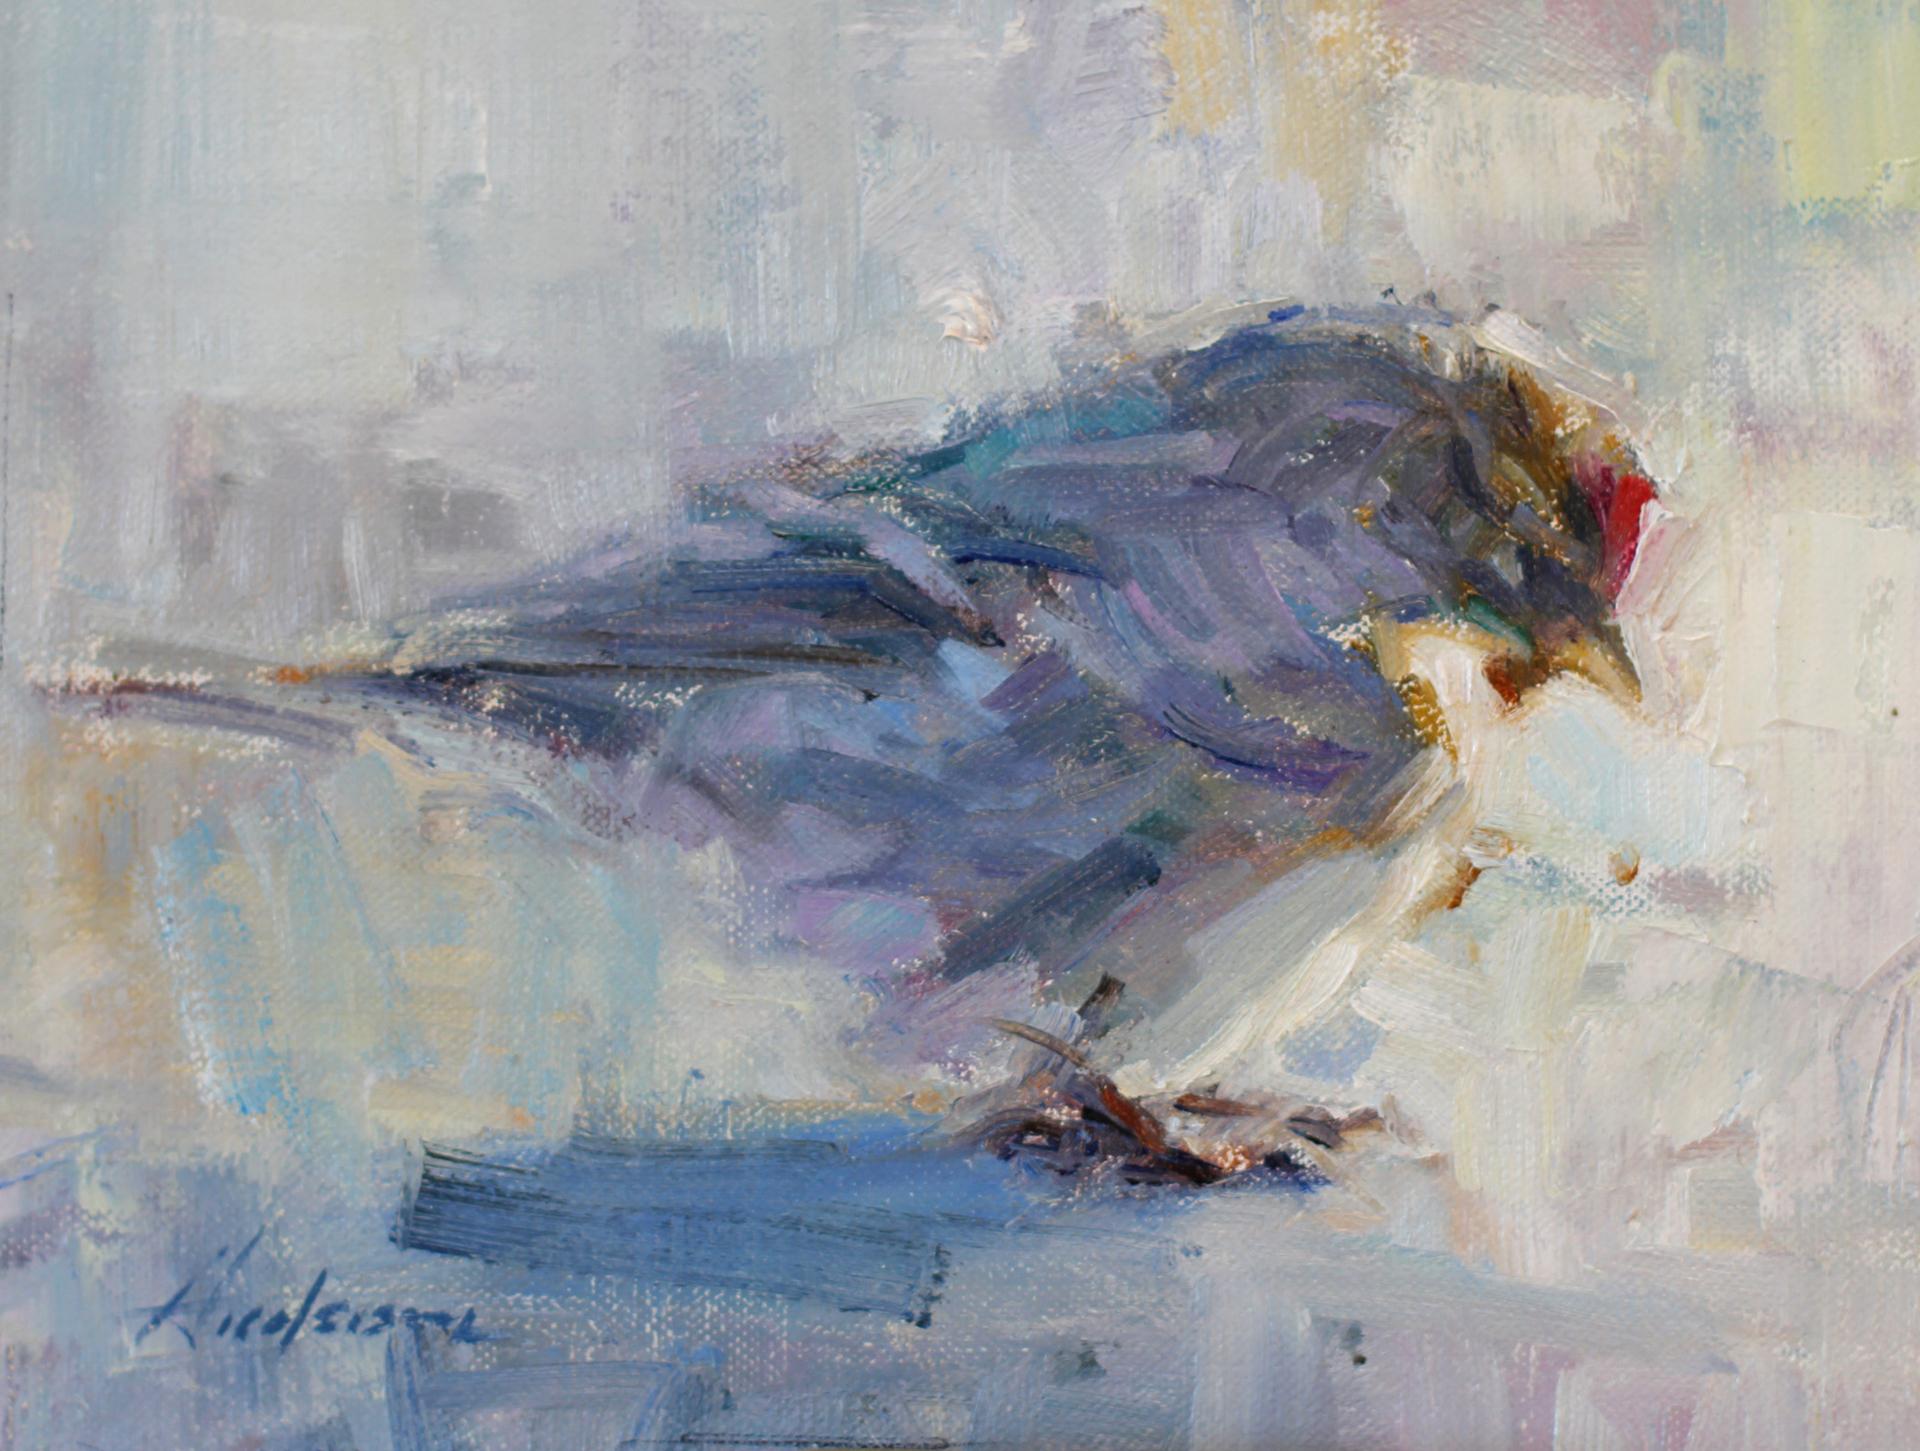 Redpoll by Carolyn Anderson